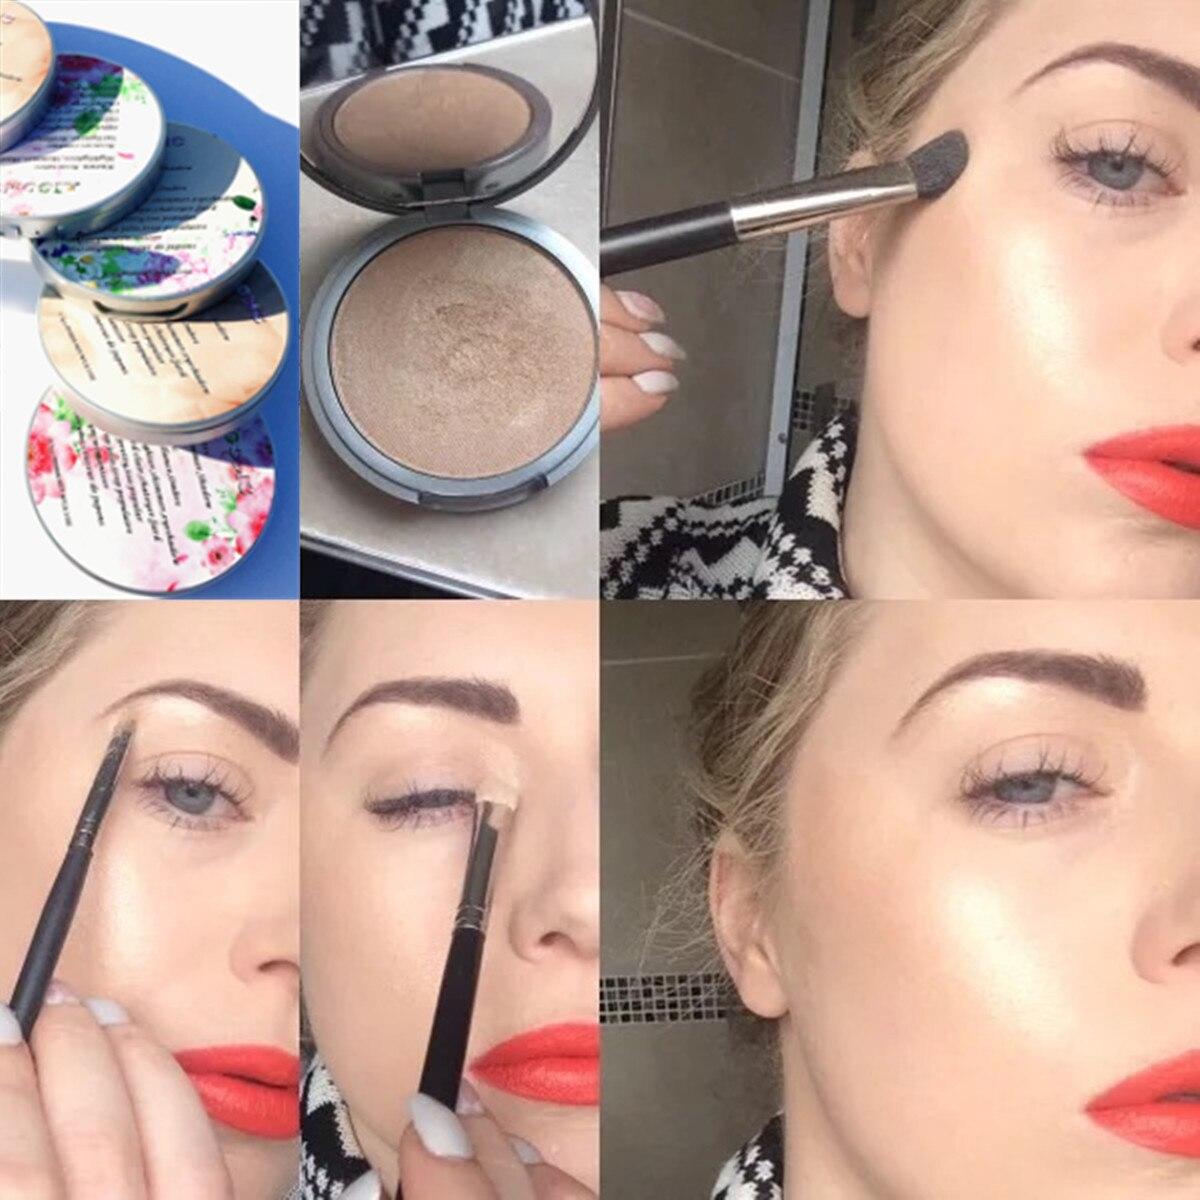 AIGOMC Highlighter Makeup 3 Colors Natural Glow Illuminator Make Up Base Highlighter Palette Glitter Contour Powder Brighten